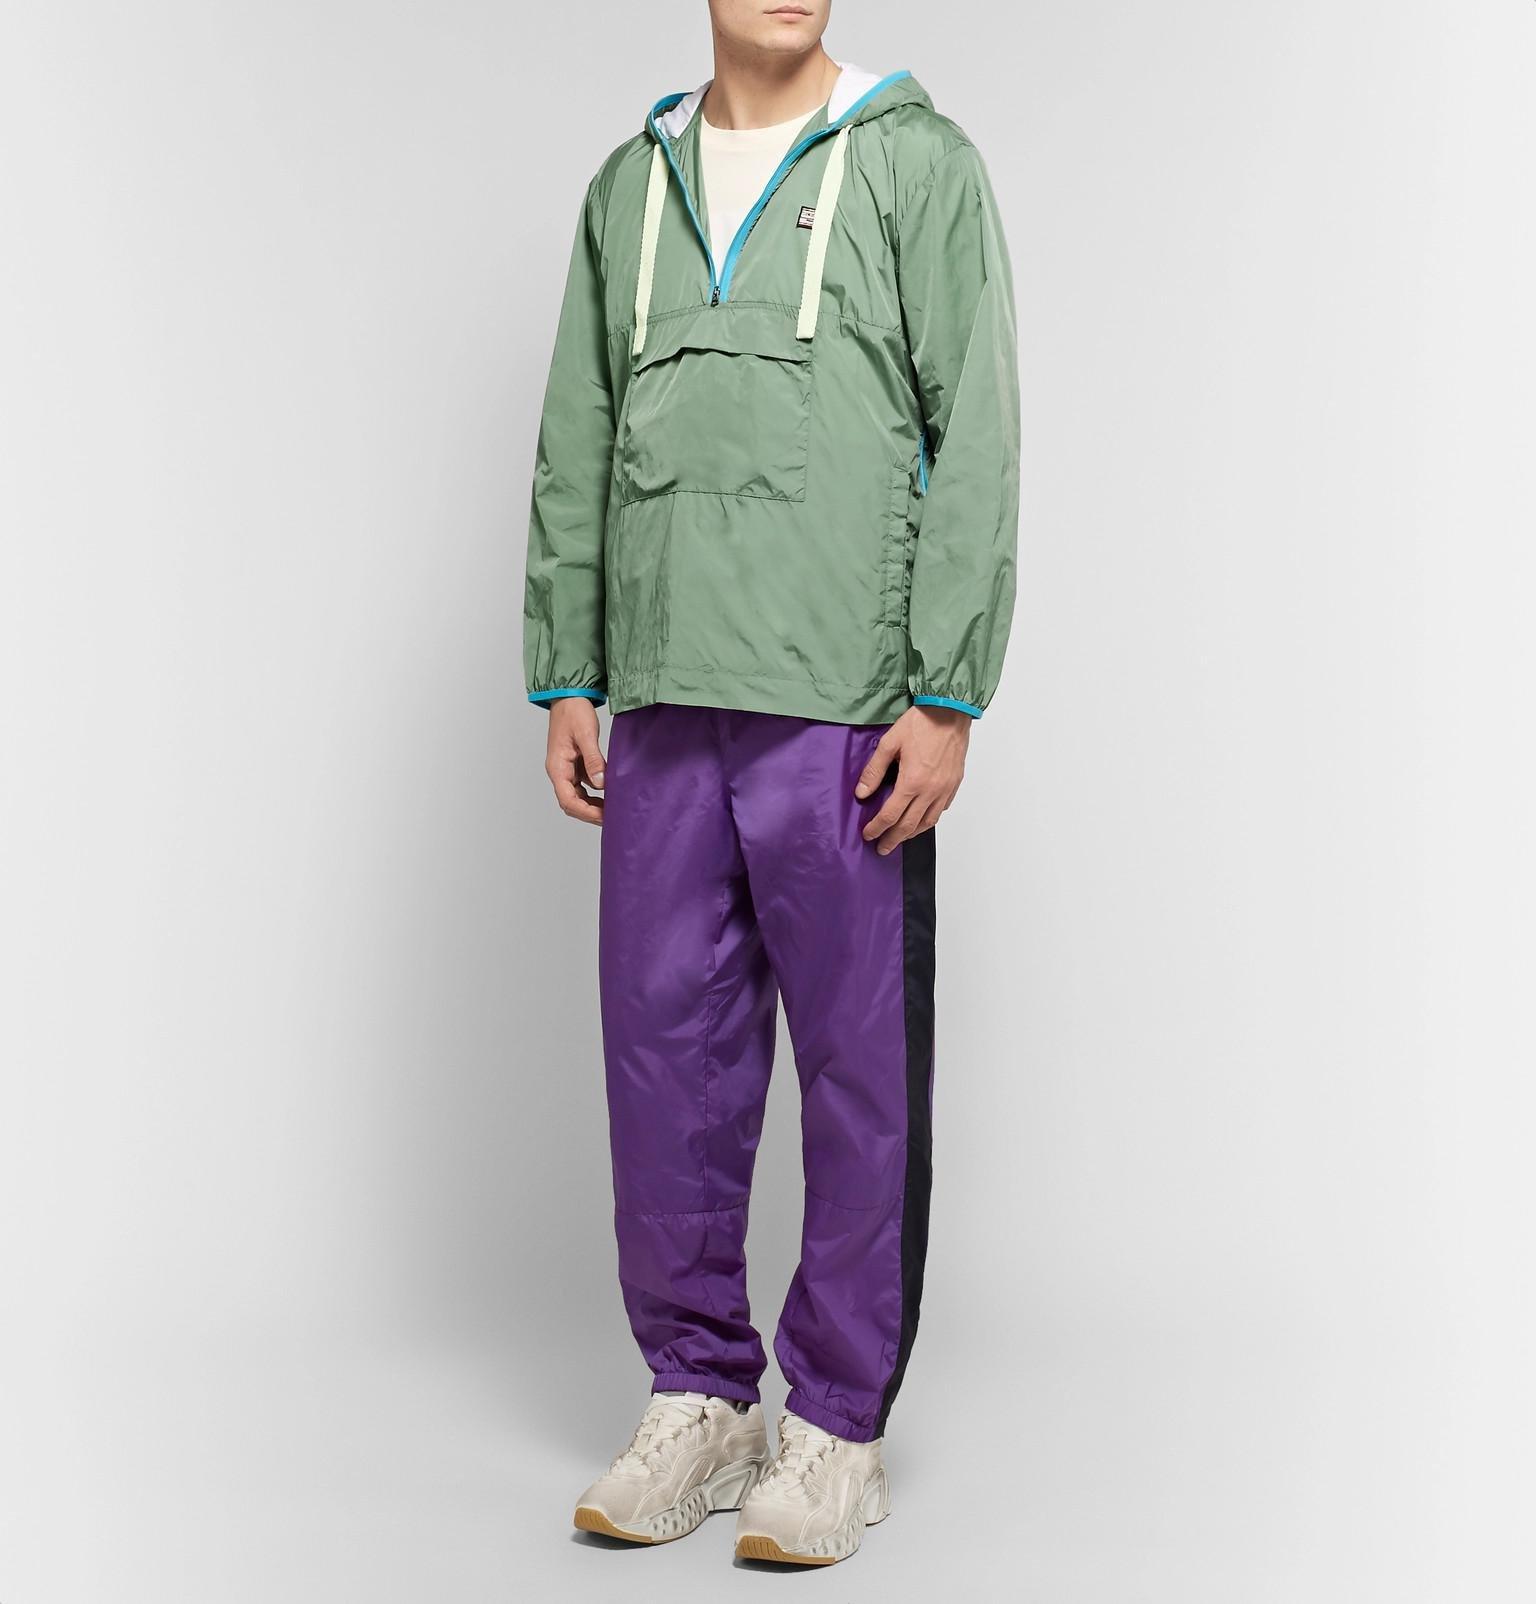 b3c95e12003370 acne-gray-green-Osaze-Logo-appliqued-Nylon-Hooded-Anorak.jpeg